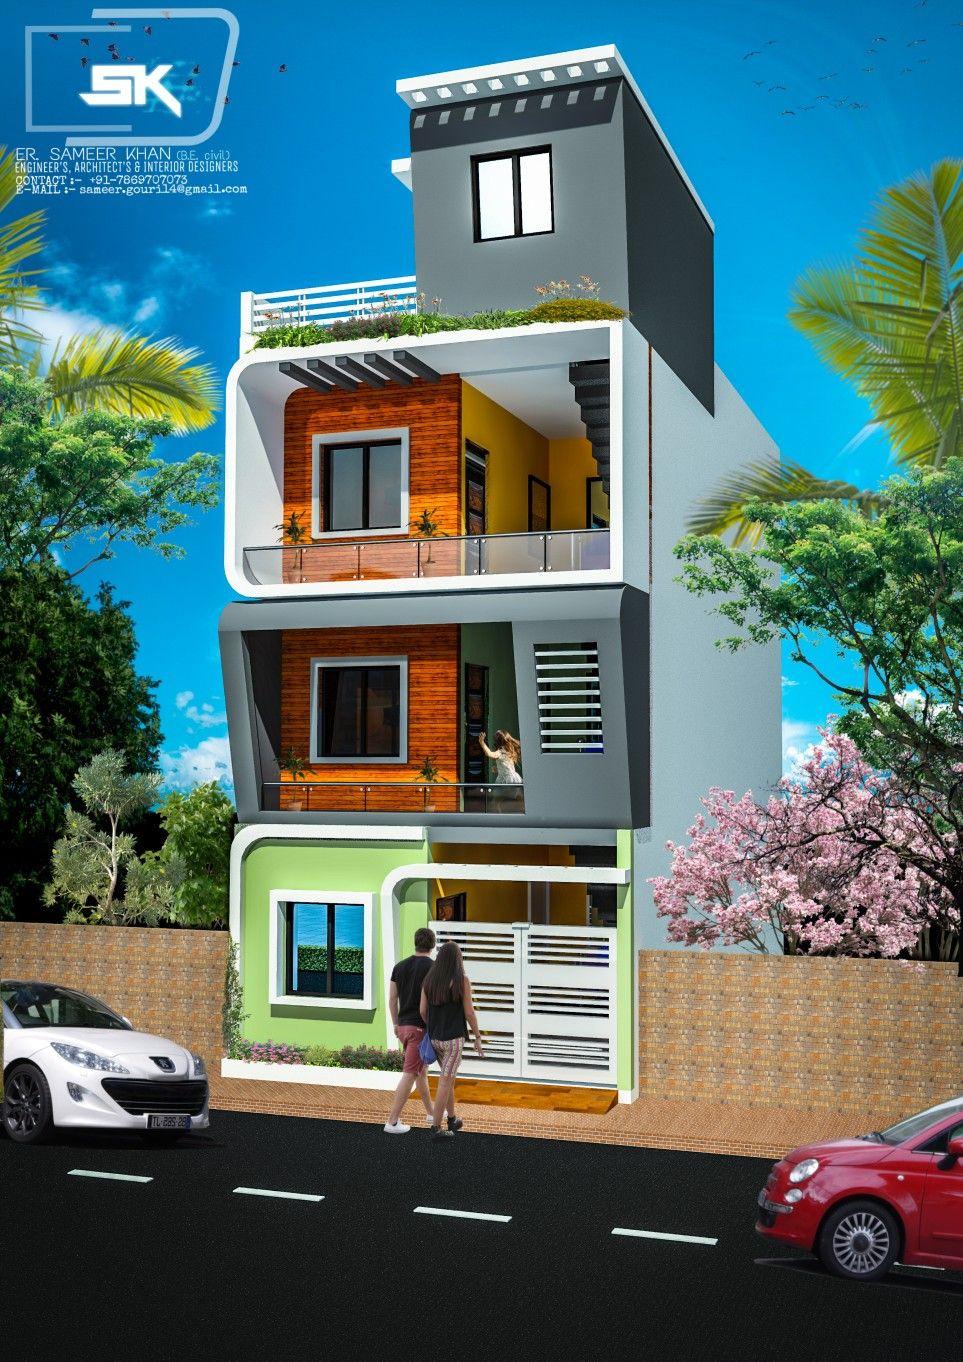 Introducing modern house exterior elevations of g 2 house by er sameer khan uniquehomedesigner